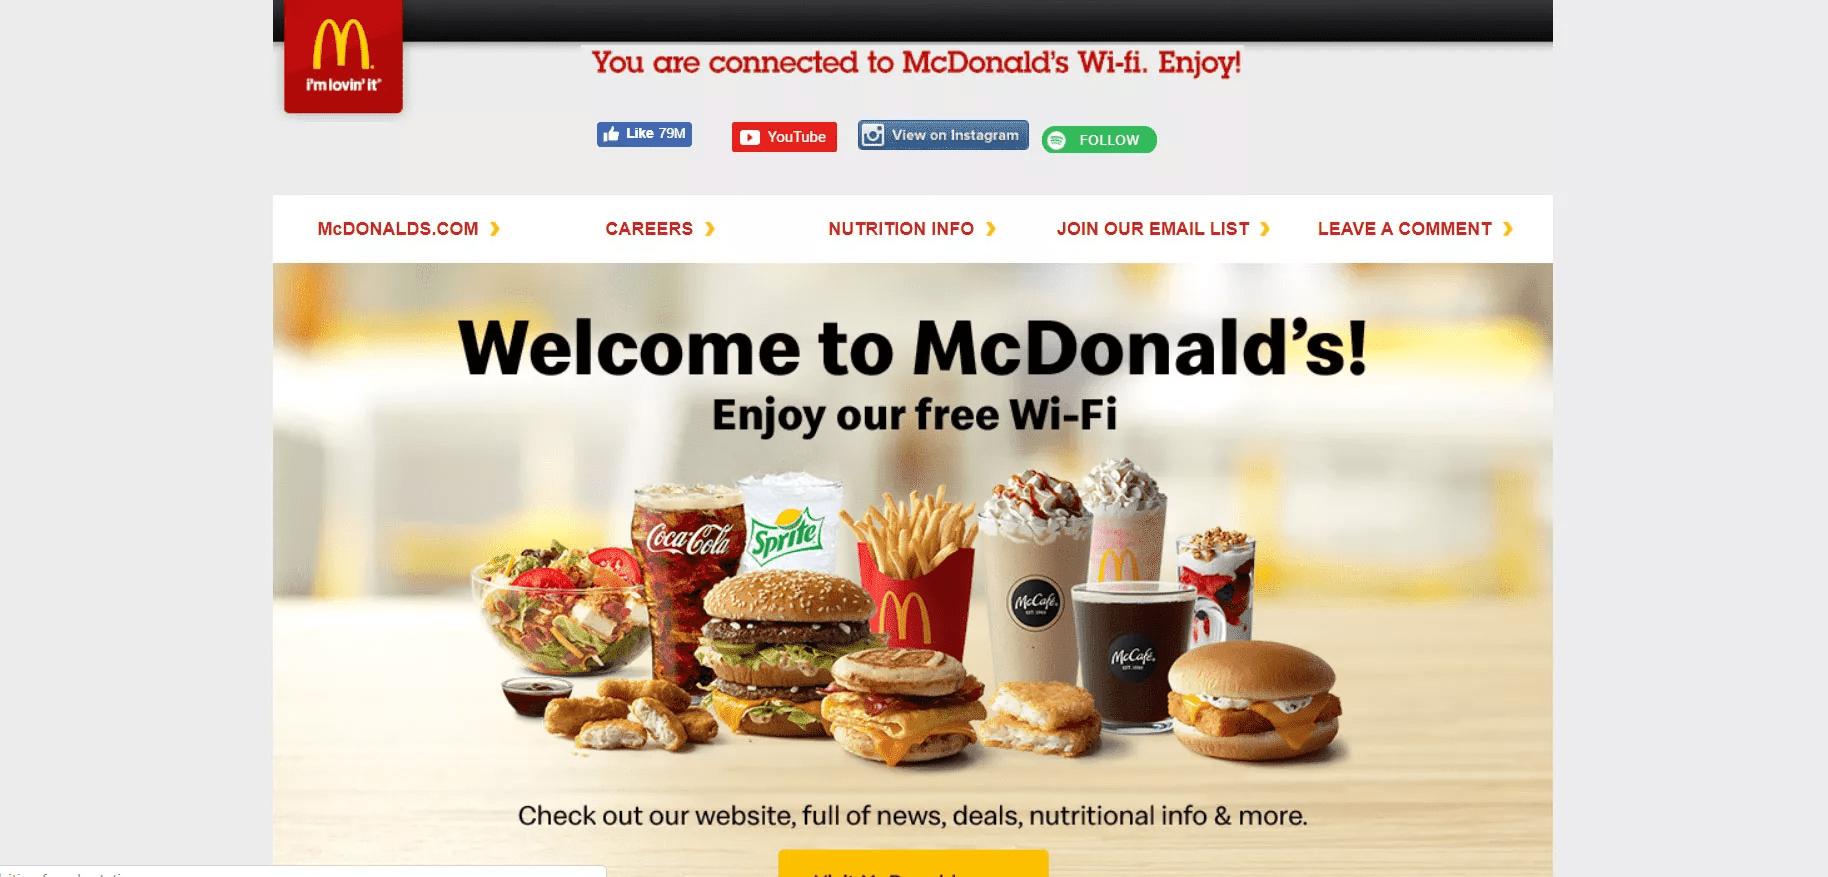 mcdonalds wifi sign in